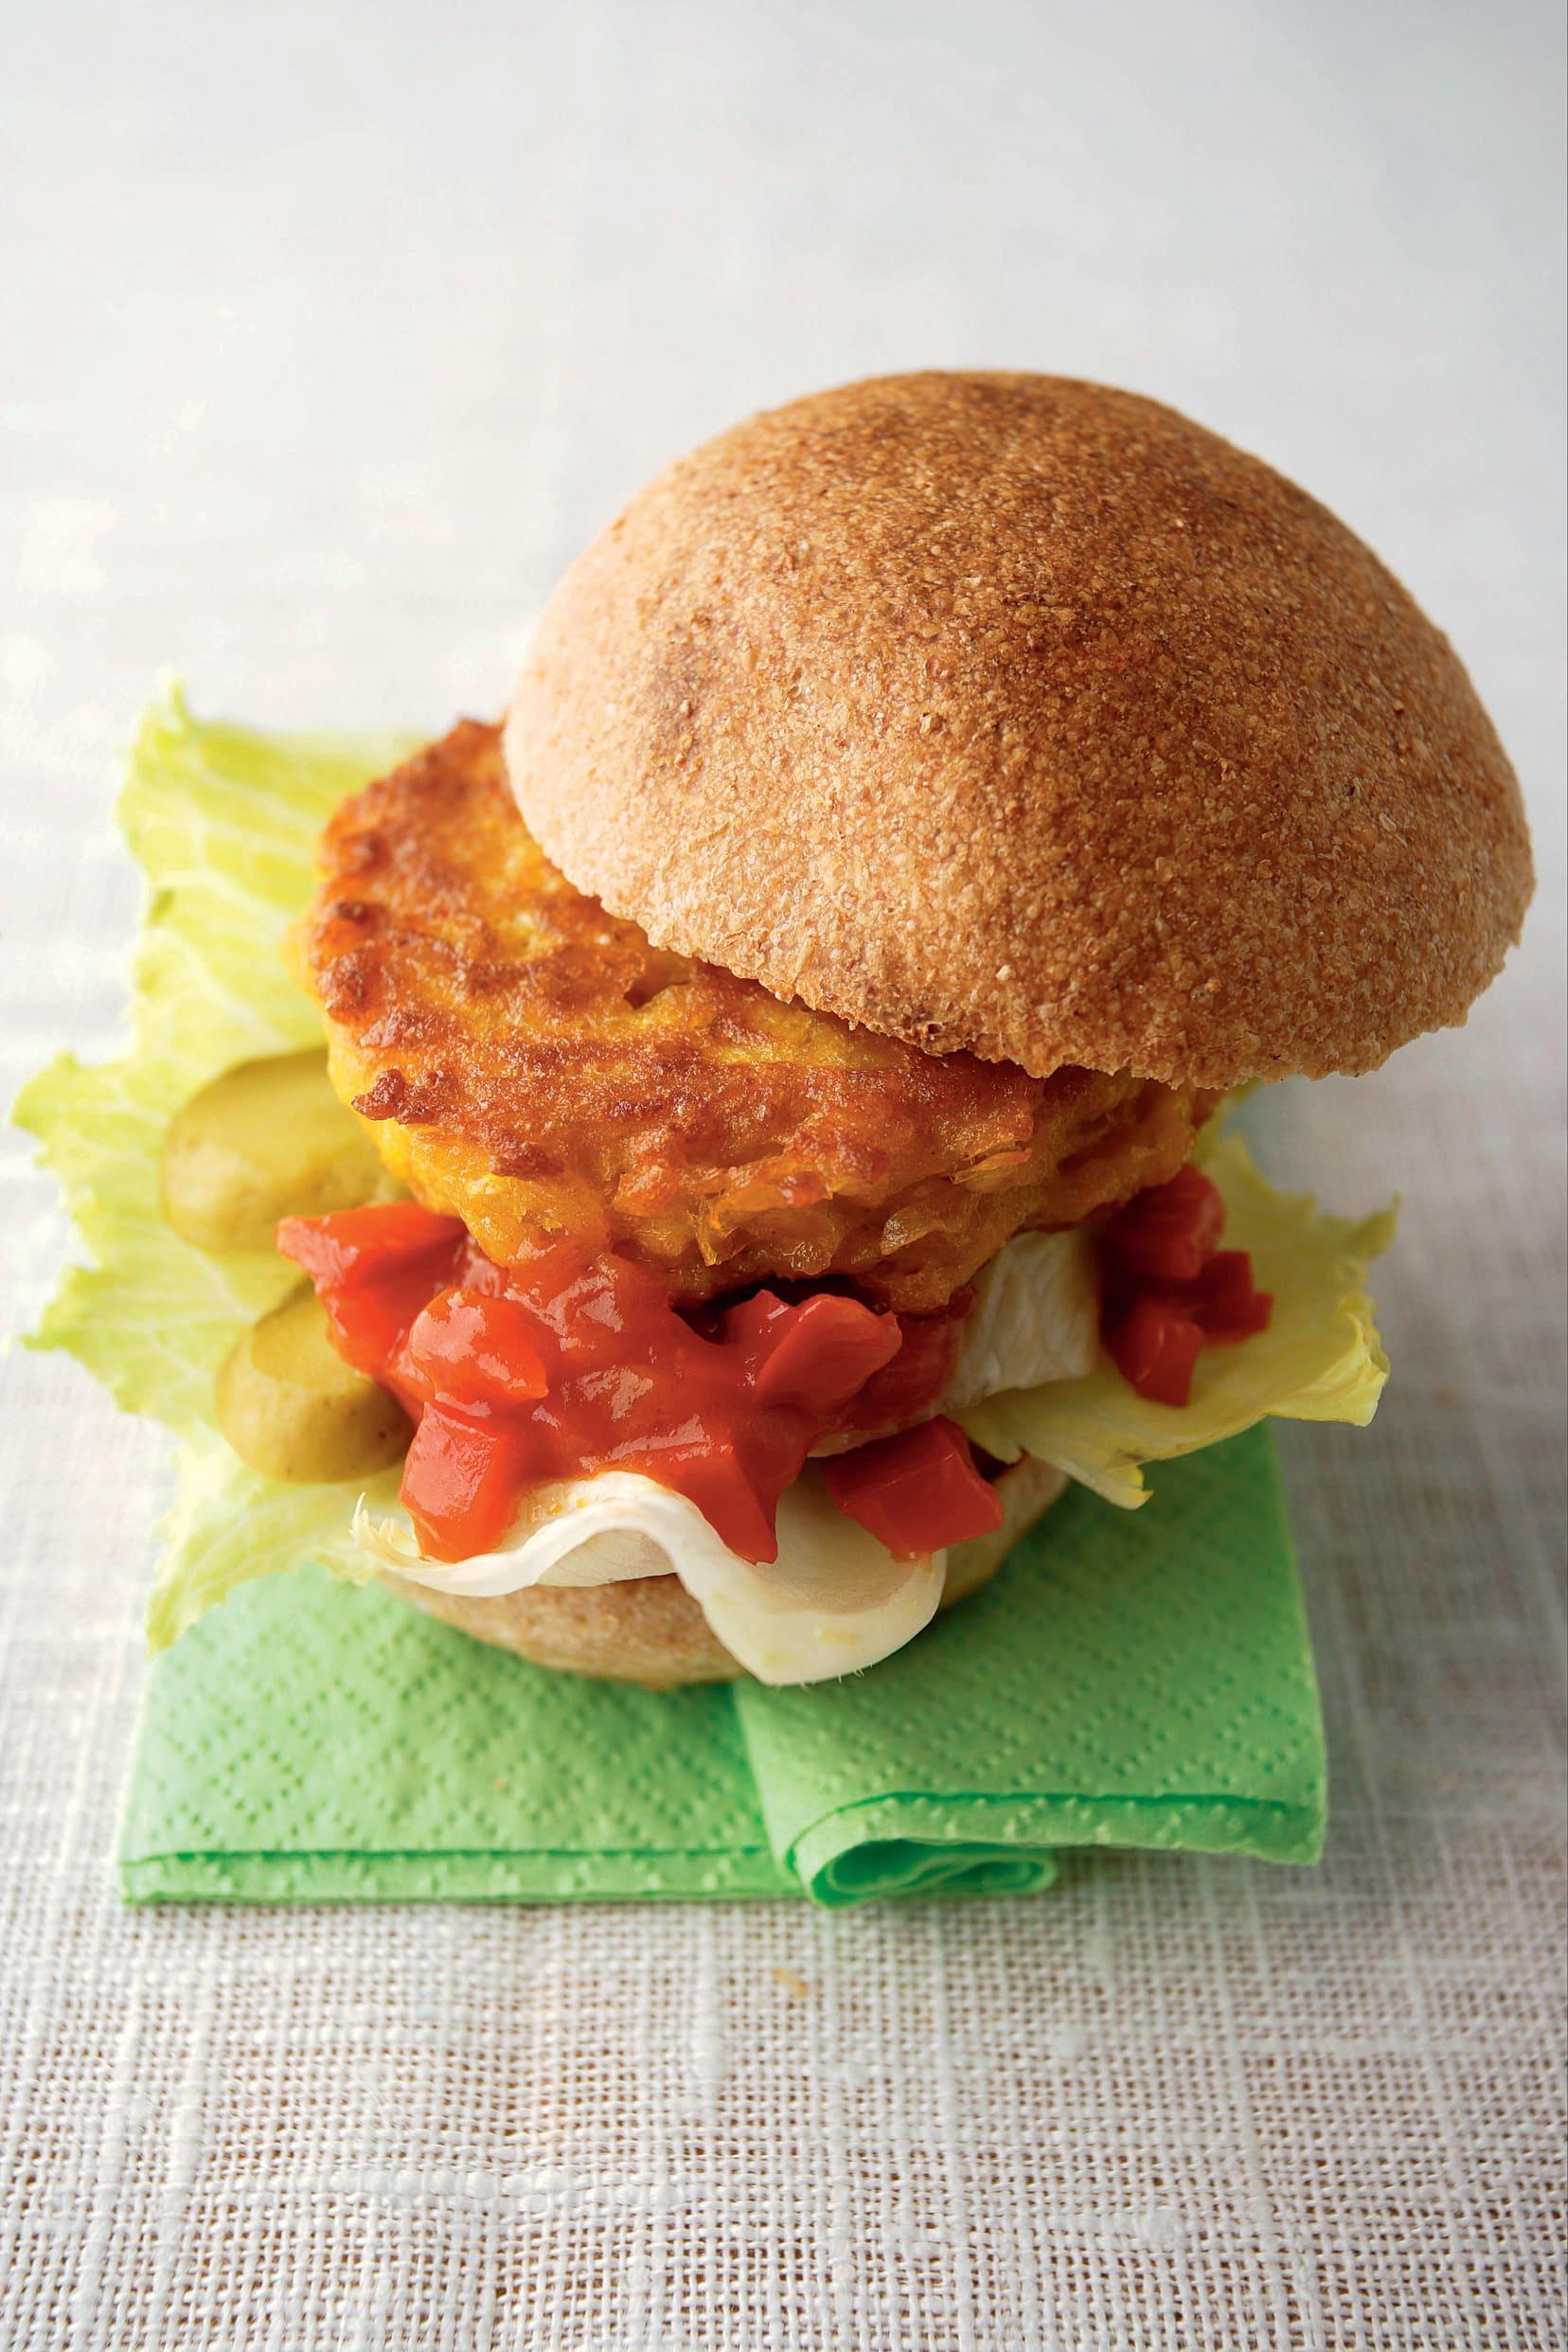 Hamburger au maïs et ketchup piquant (veggie burger)